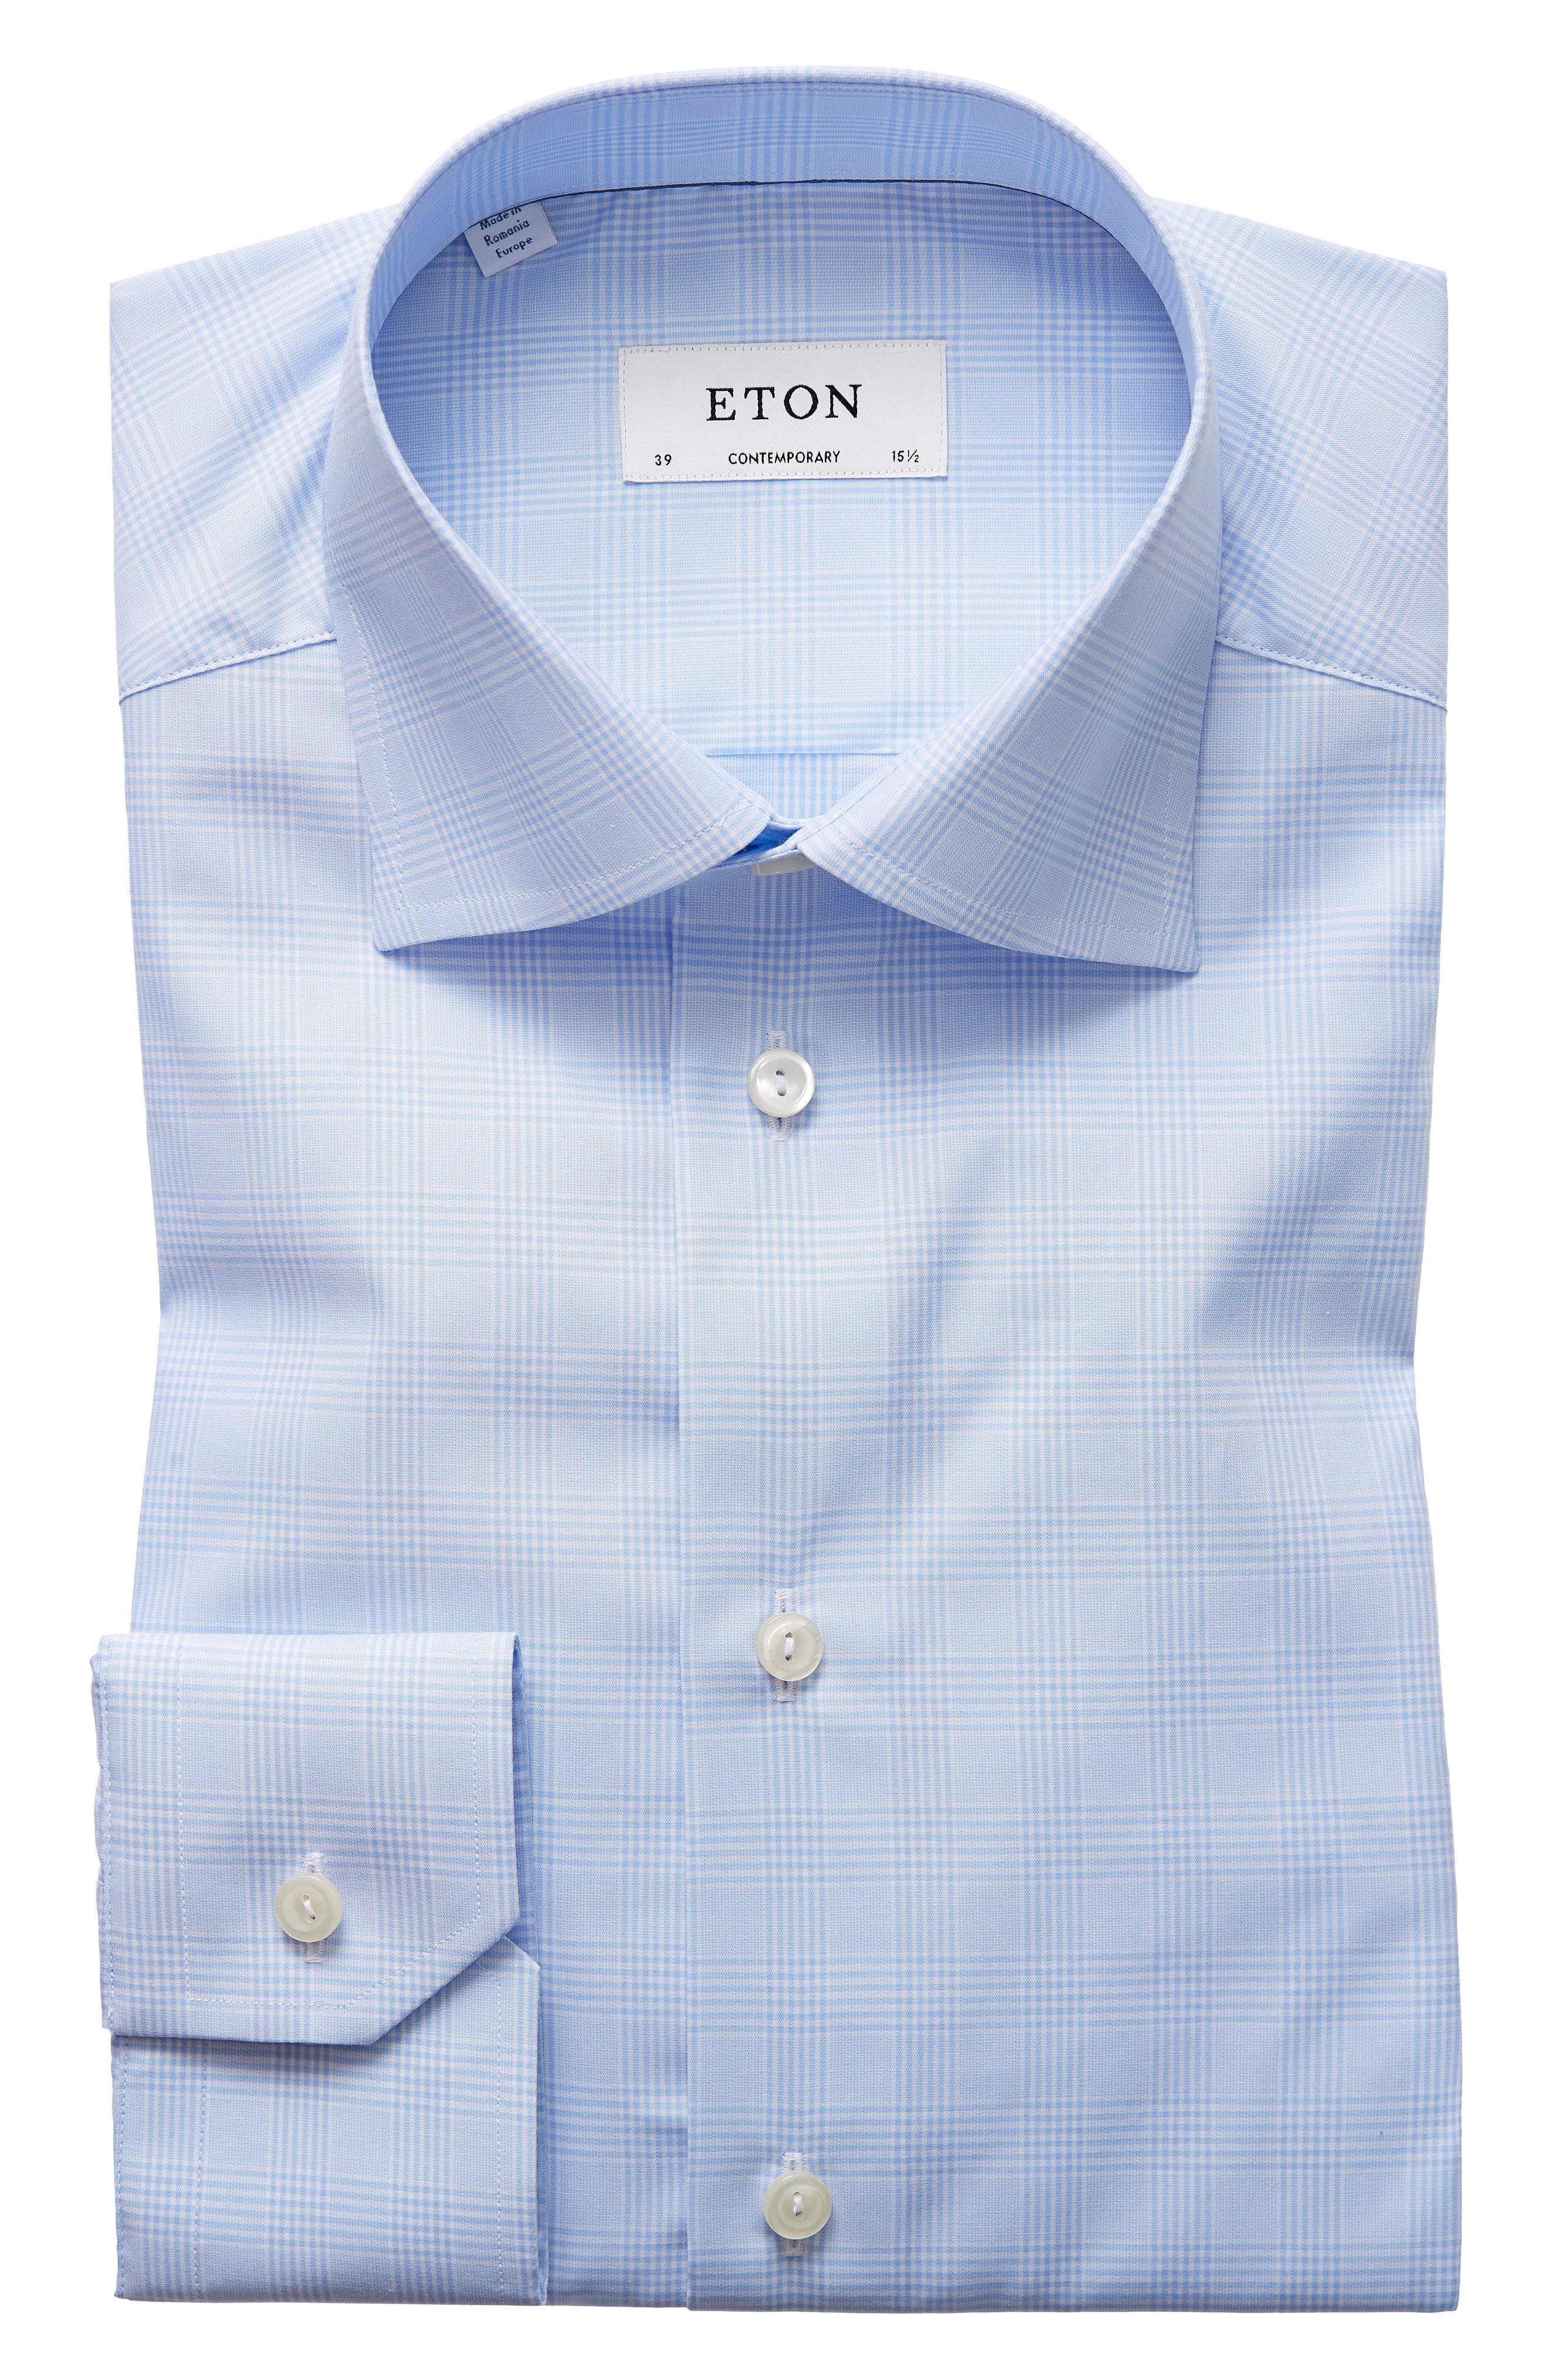 Main Image - Eton Contemporary Fit Plaid Dress Shirt